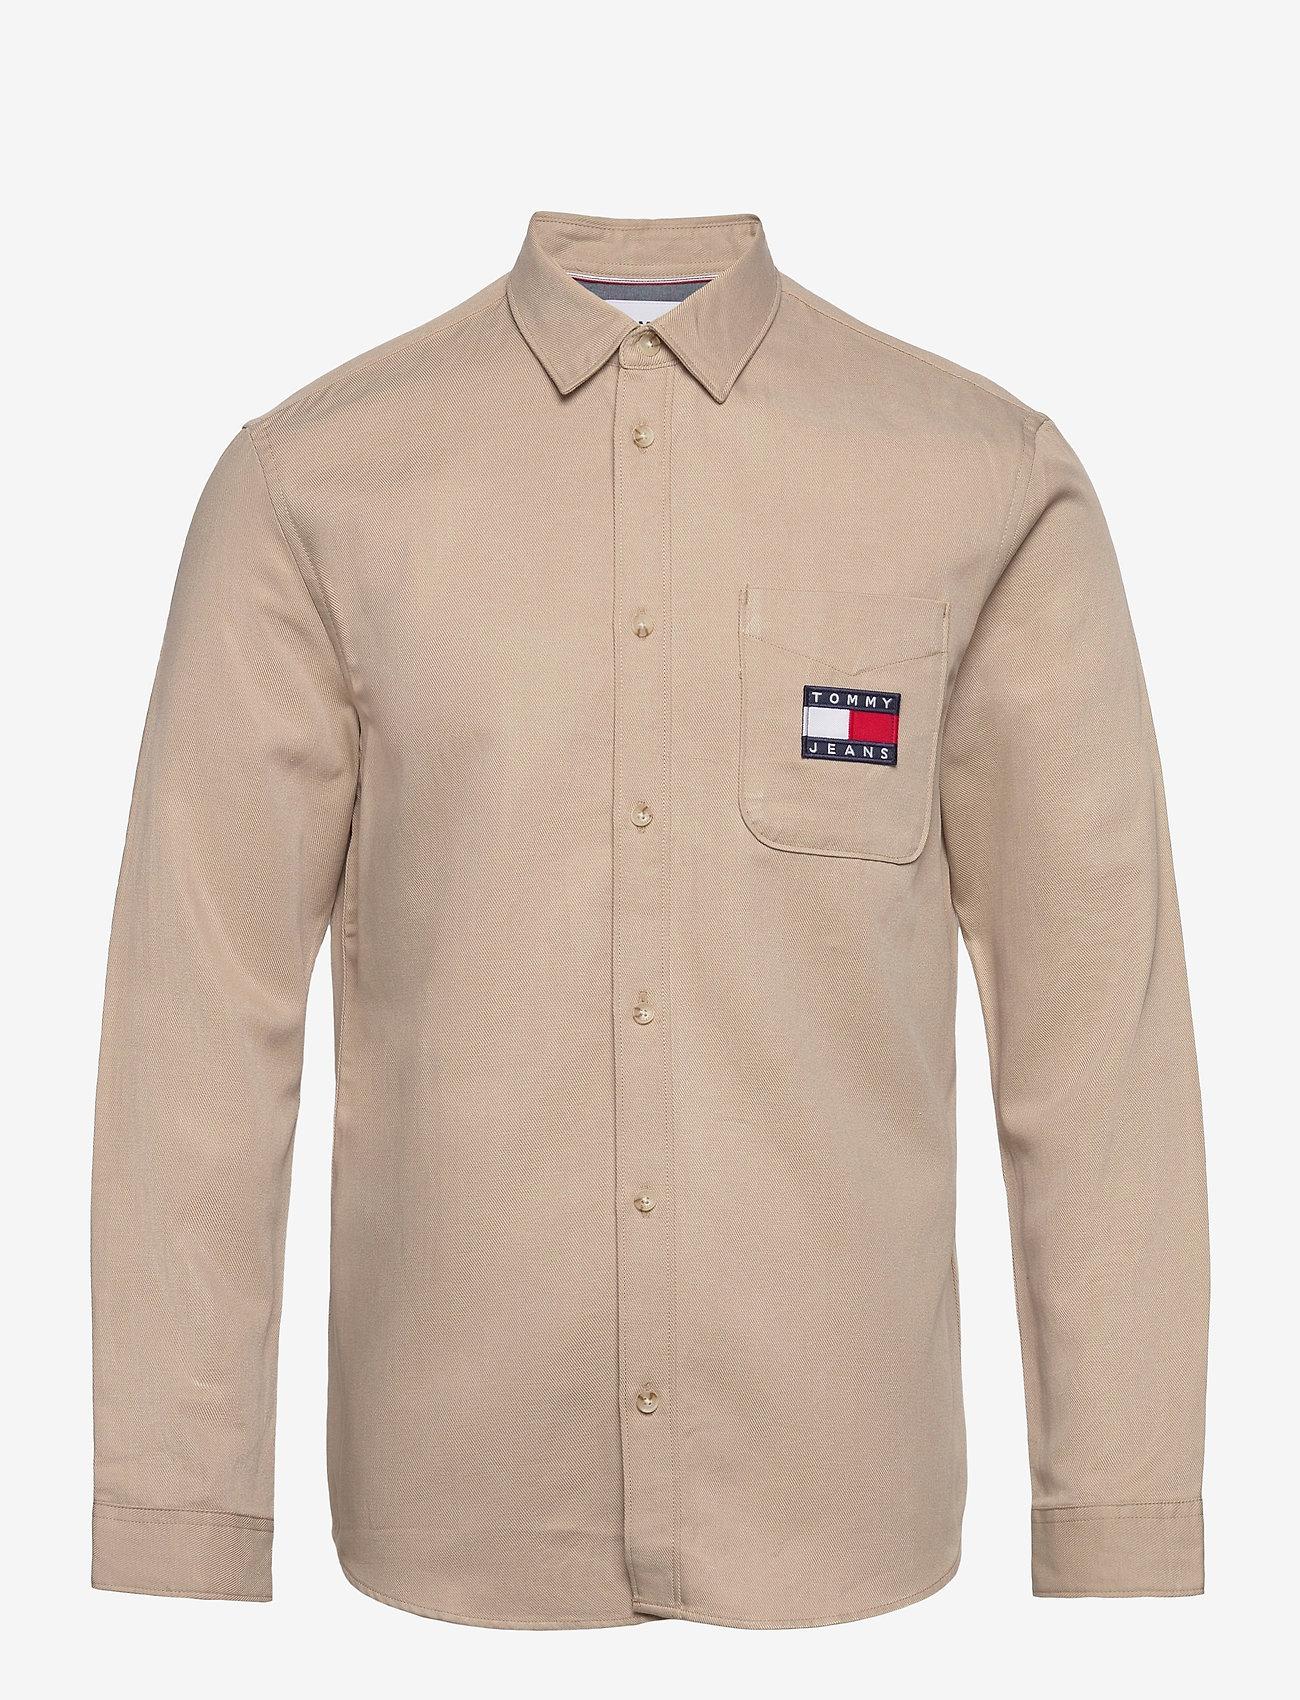 Tommy Jeans - TJM BADGE TENCEL TWILL SHIRT - basic skjortor - soft beige - 1